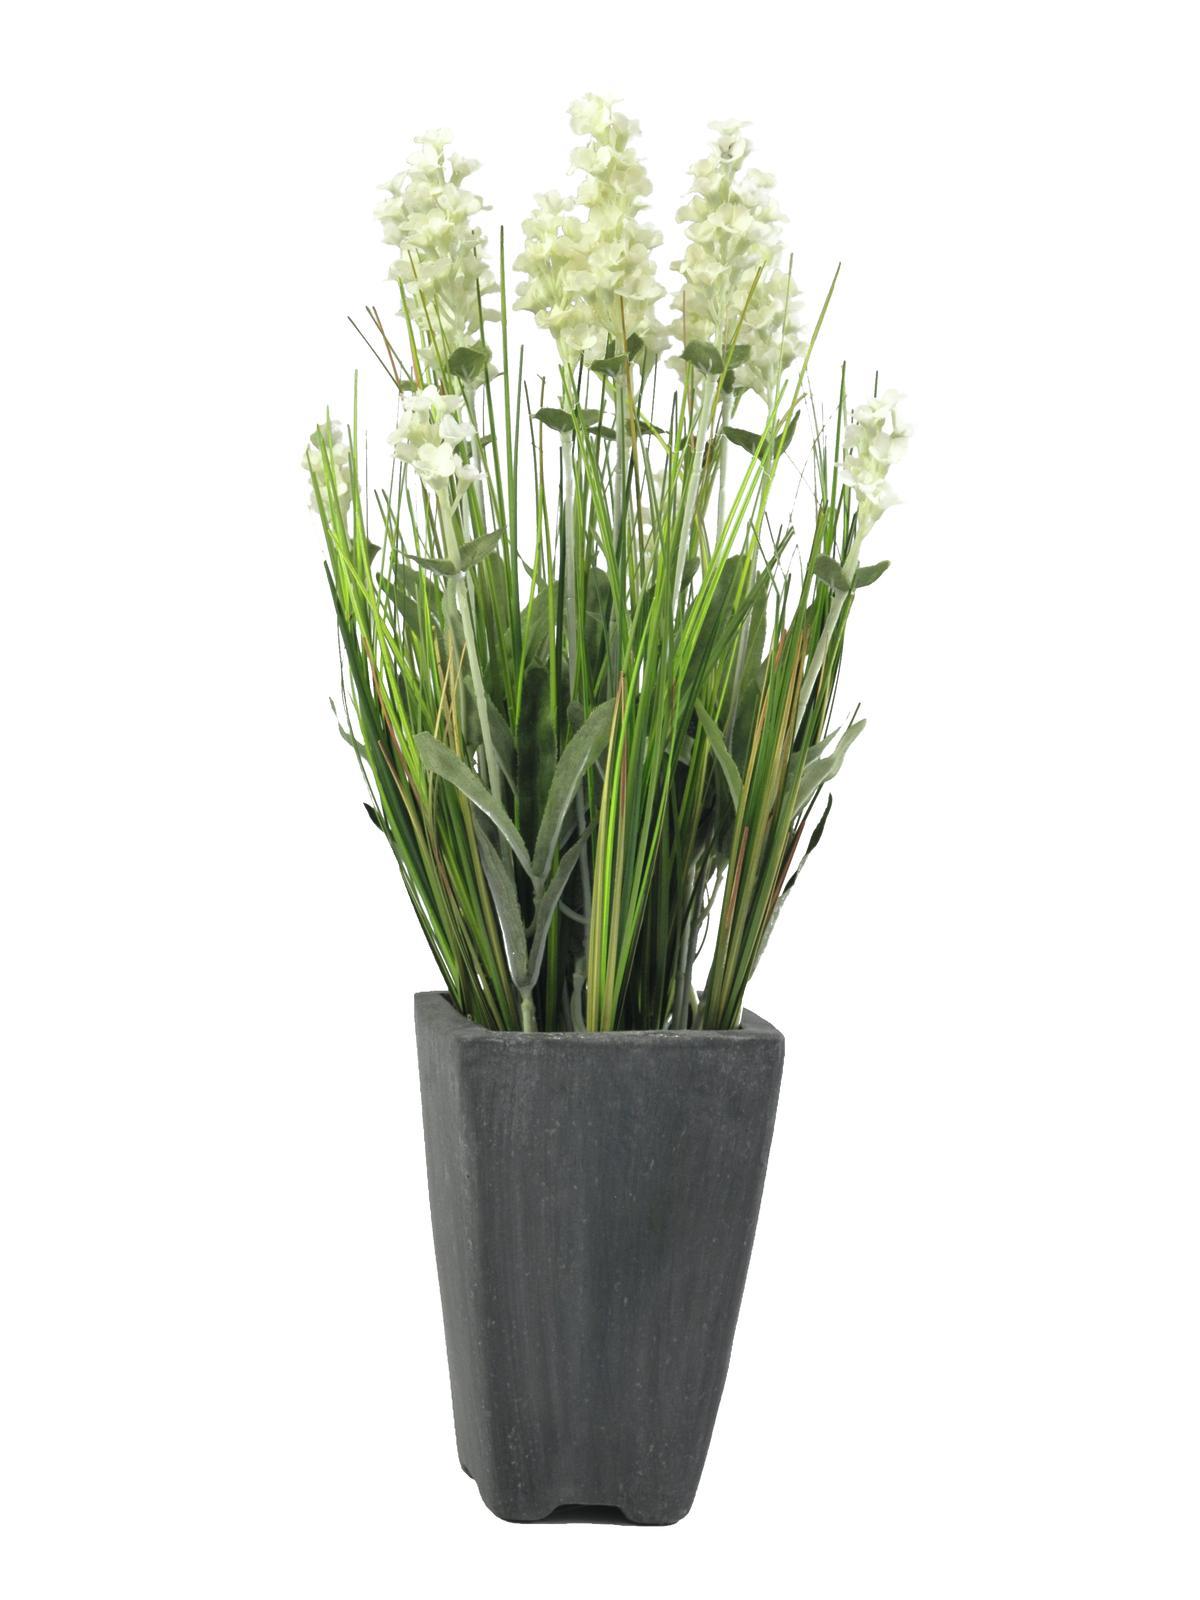 EUROPALMS Lavendel, Kunstpflanze, cremefarben, im Dekotopf, 45cm